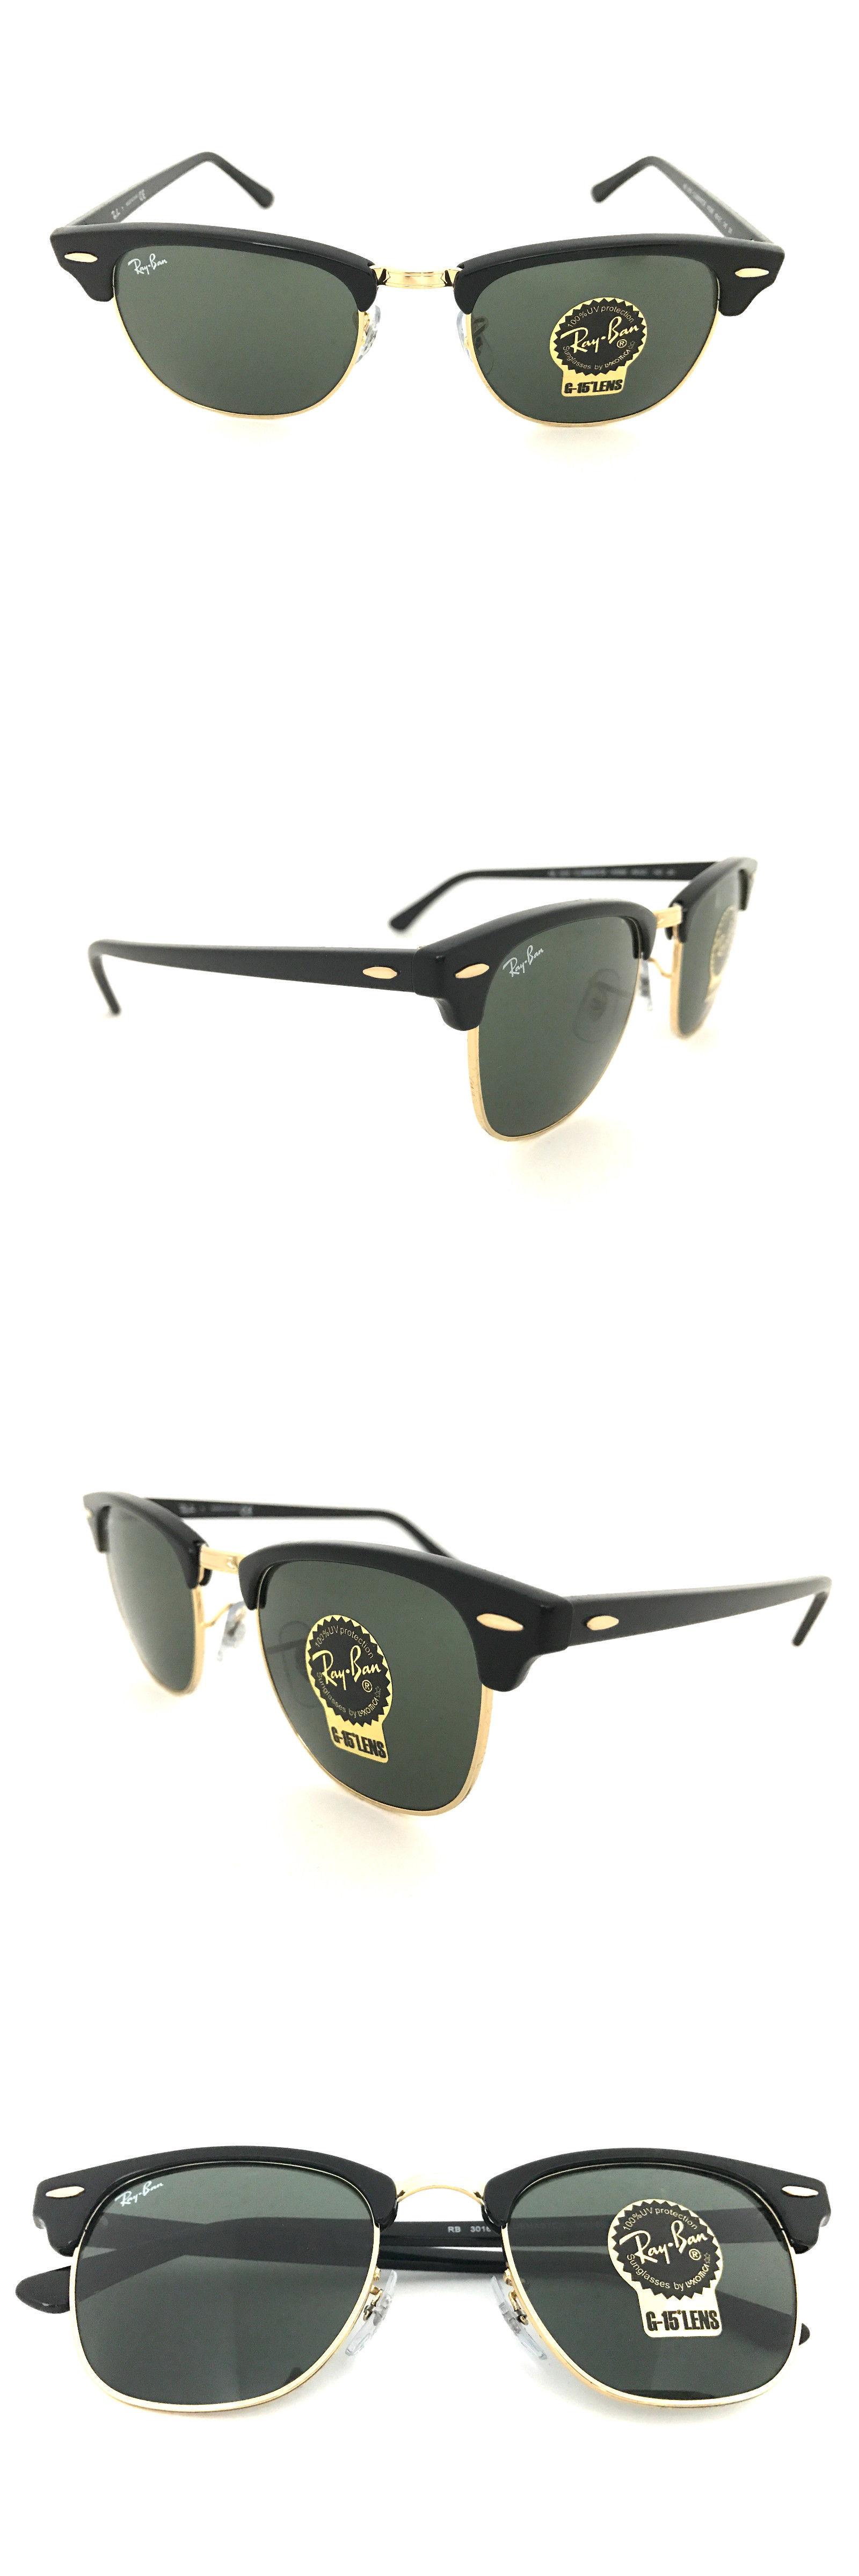 c2aa039c9c00eb reduced ray ban black clubmaster sunglasses rb3016 w0365 ebay 598fe ae137